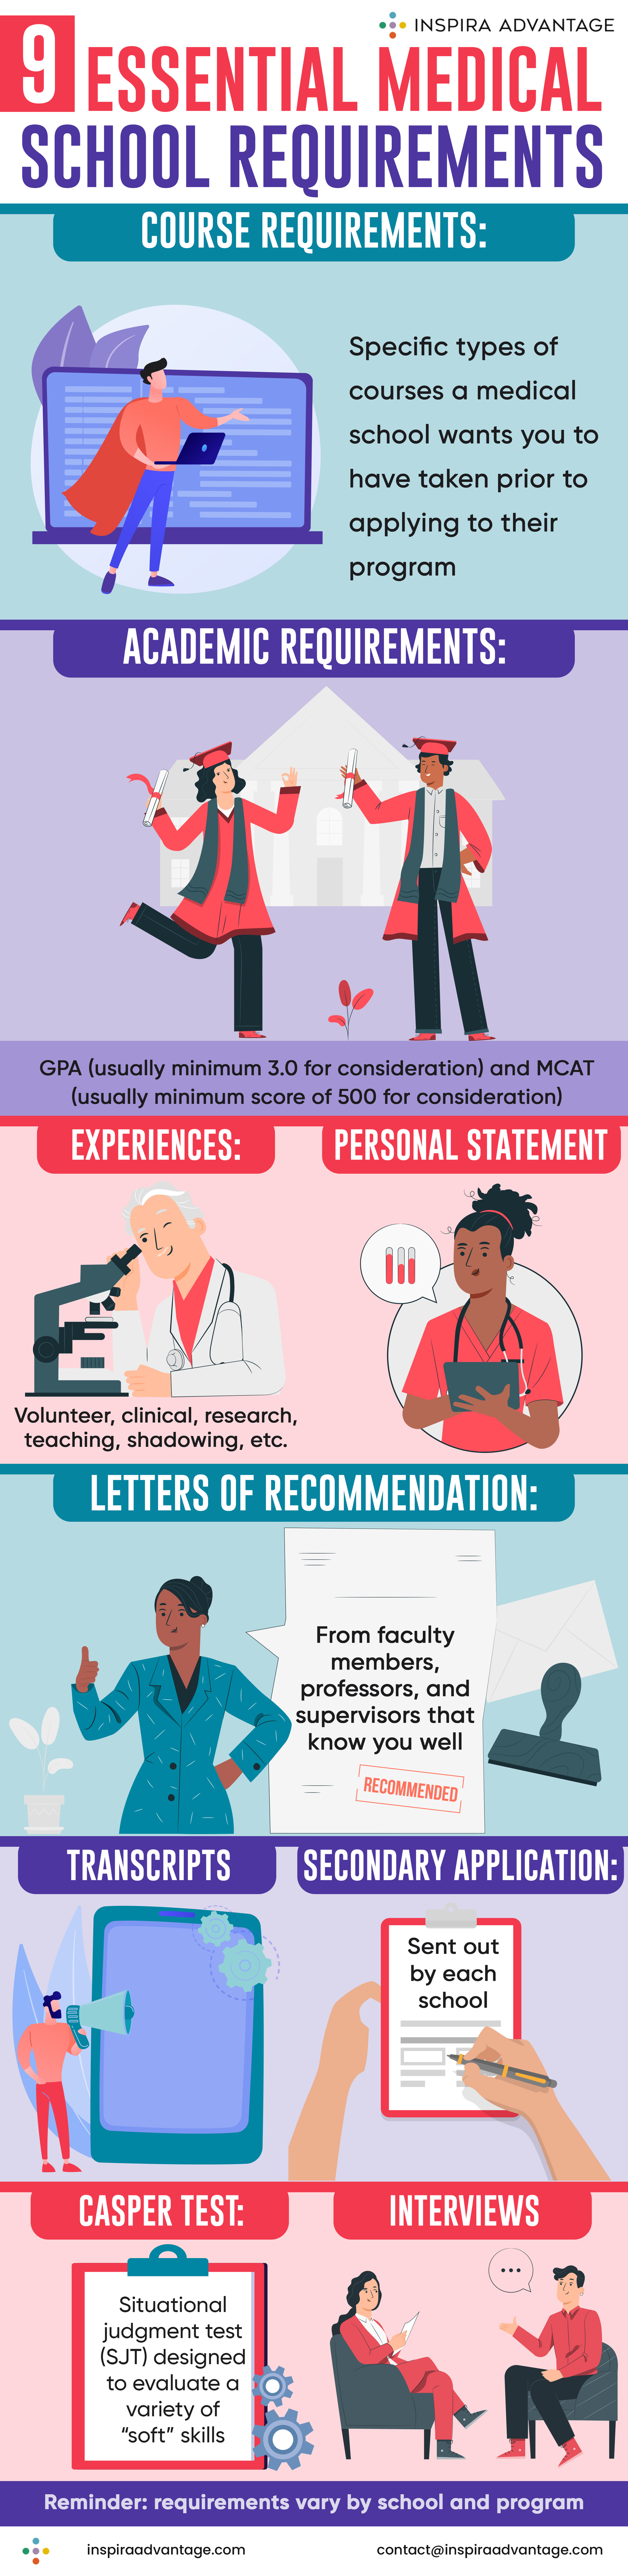 essential medical school requirements